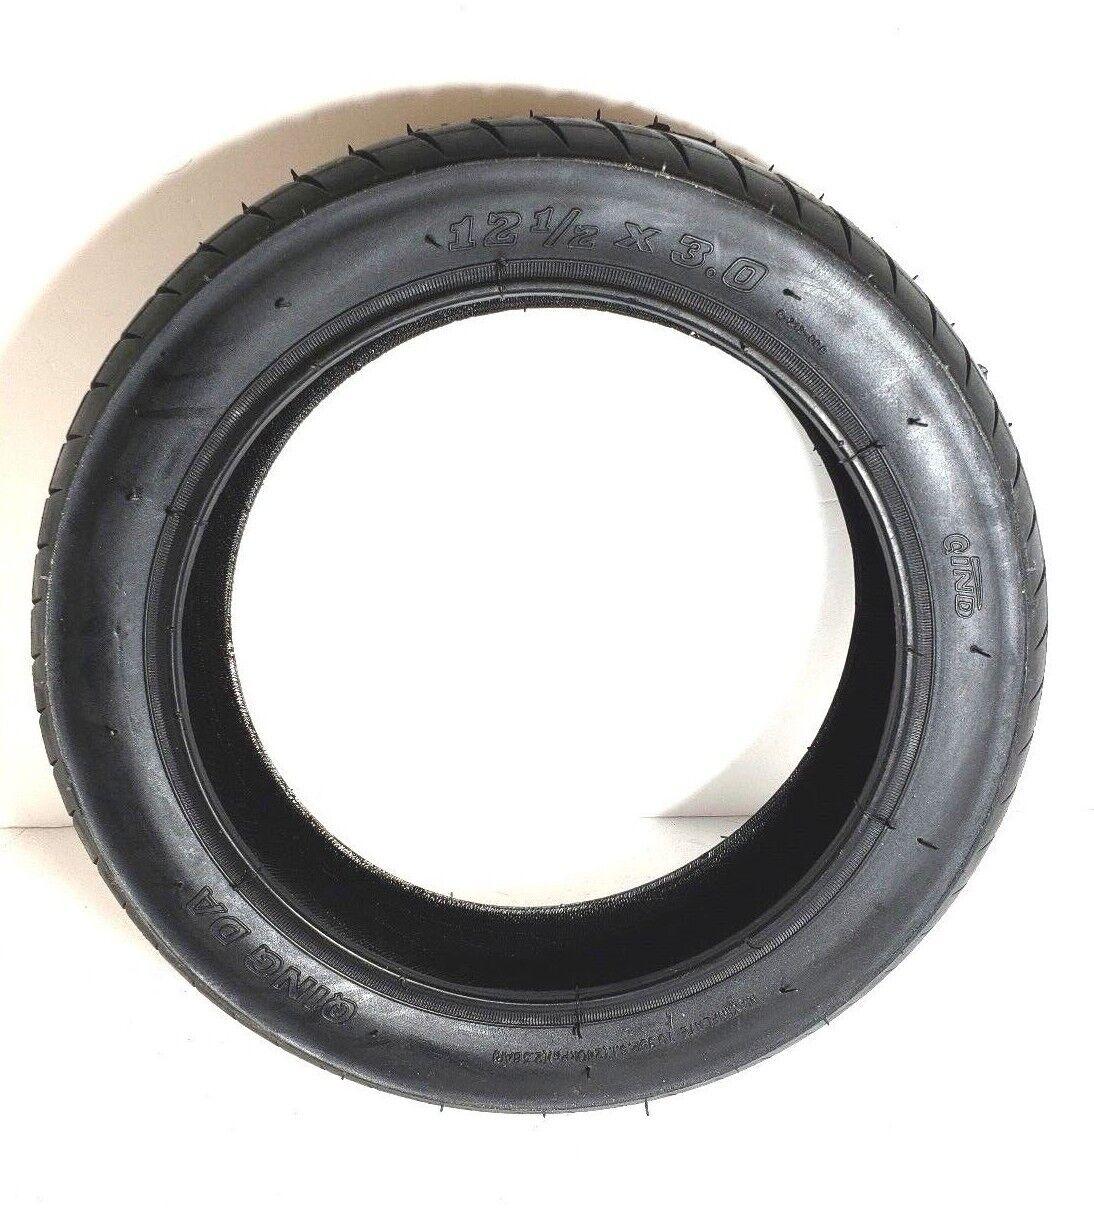 Tamaño de los neumáticos 12.5X3.0 para Currie Schwinn Street V-Groove Scooter eléctrico